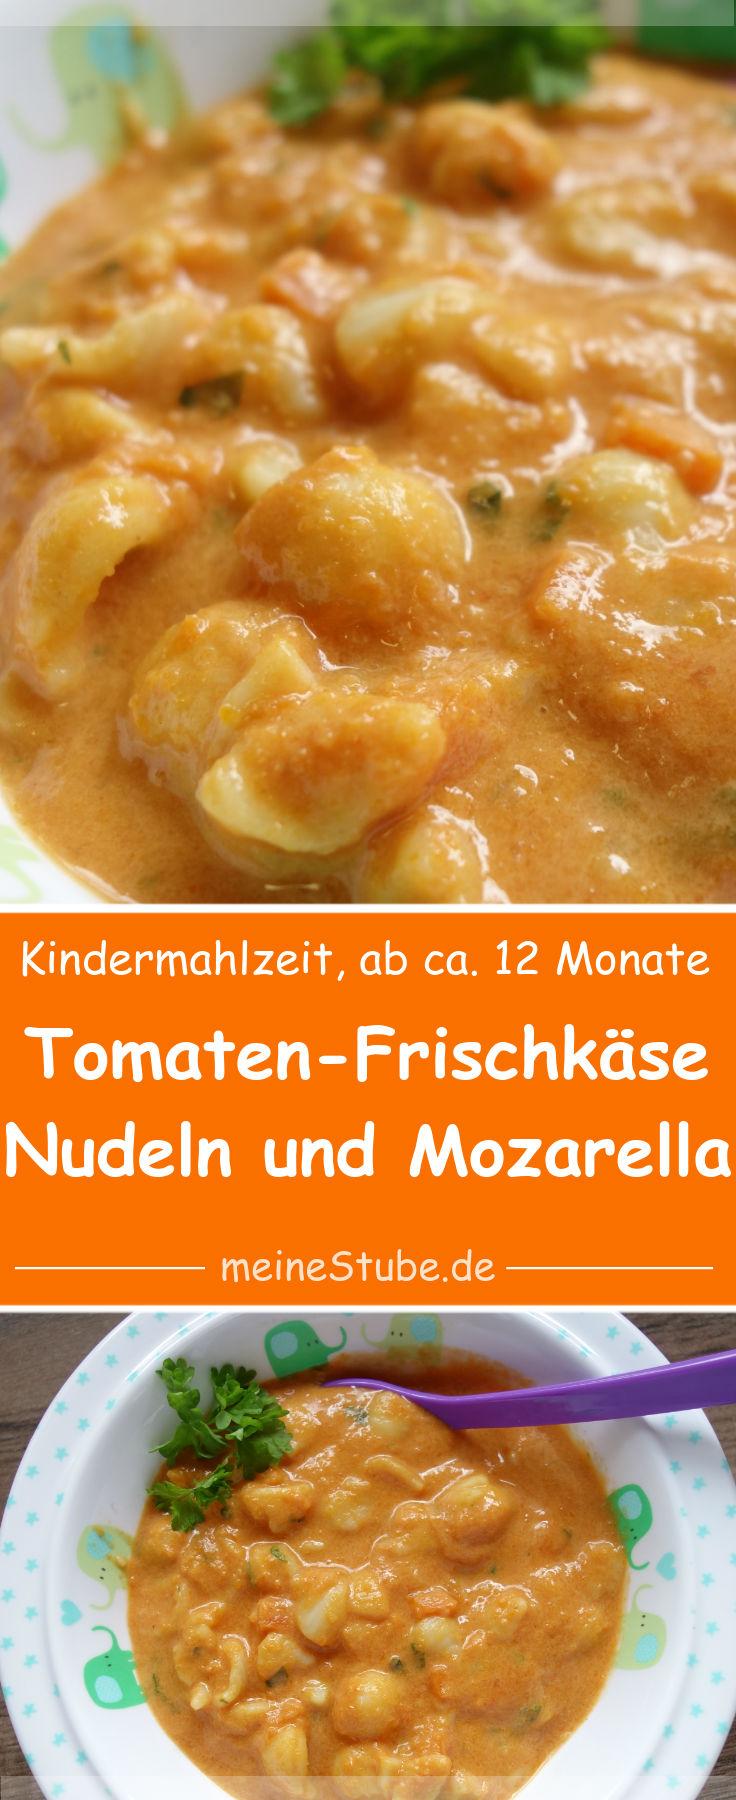 kindermahlzeit-Tomaten-Frischkaese-nudeln